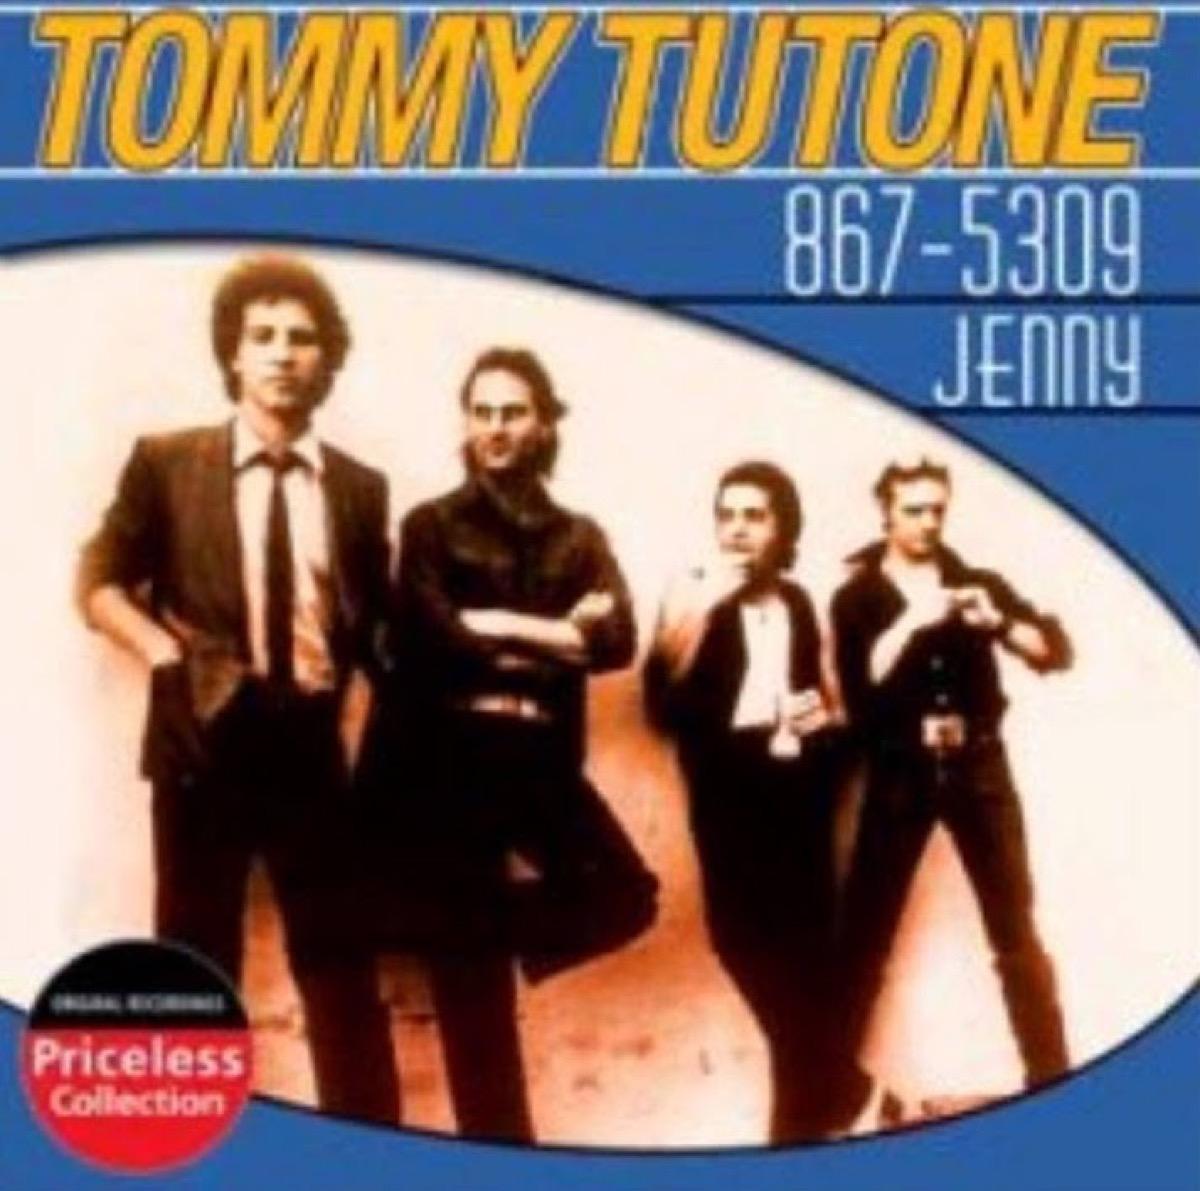 Tommy TuTone, Jenny, One hit wonder 1980s